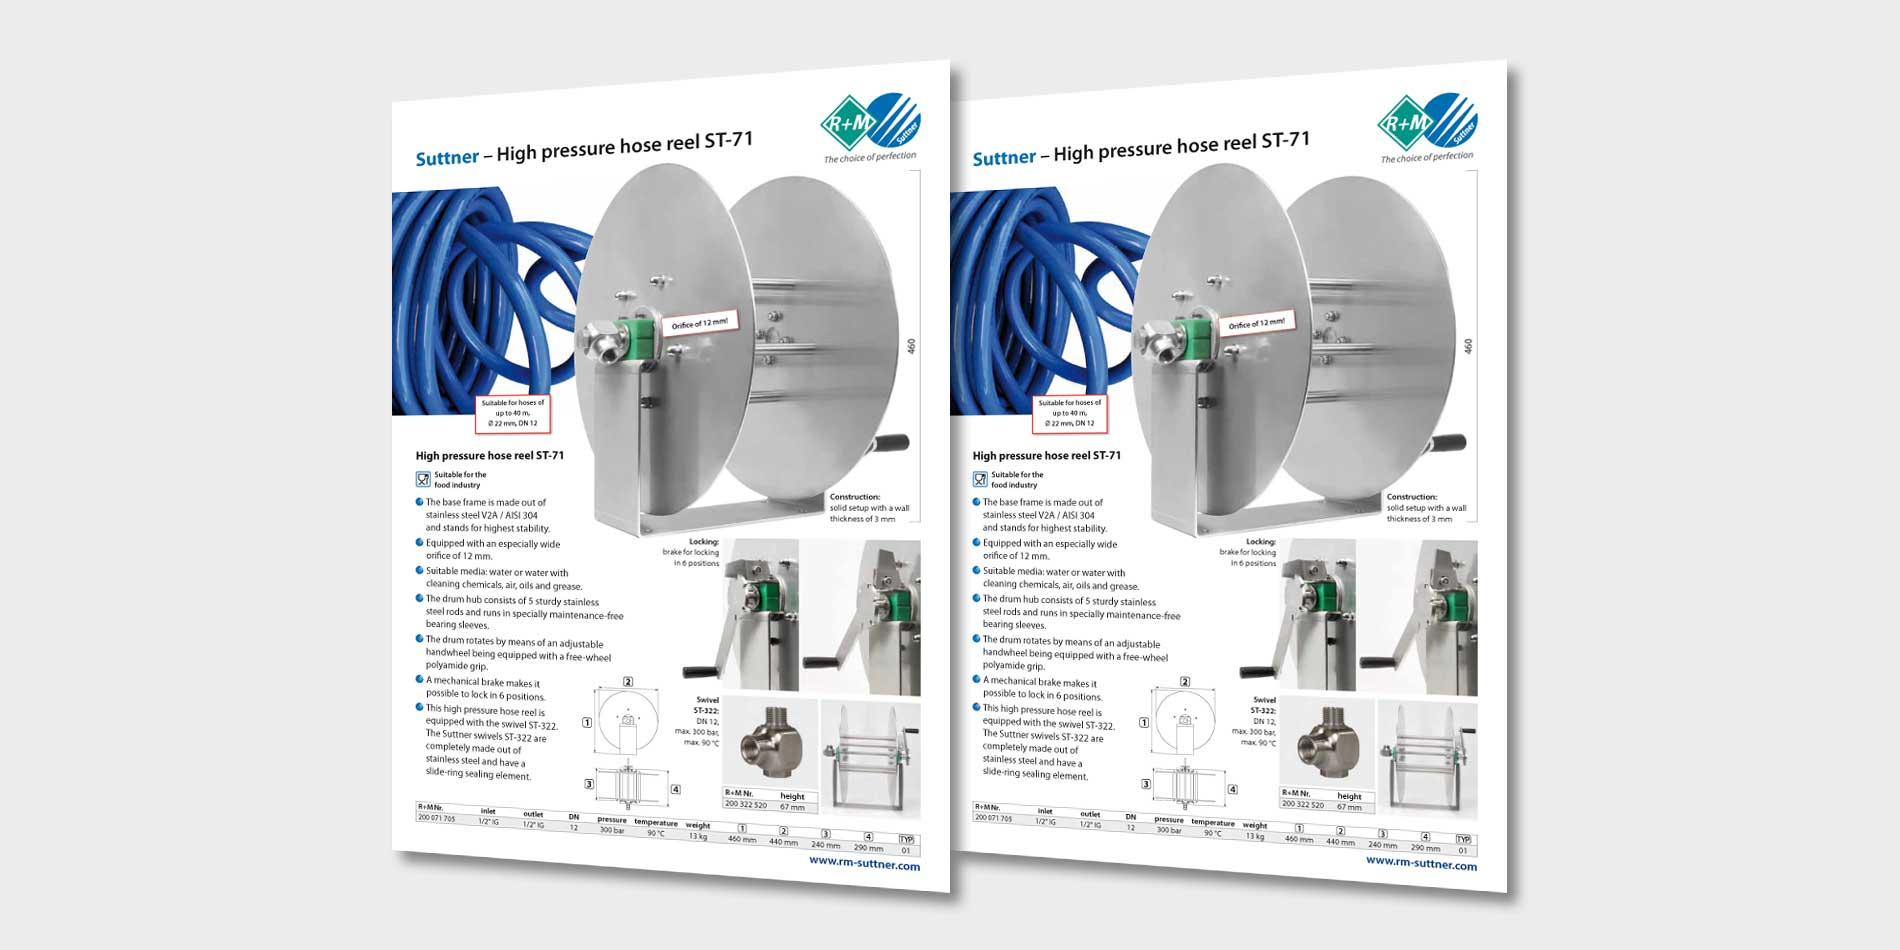 High pressure hose reel ST-71